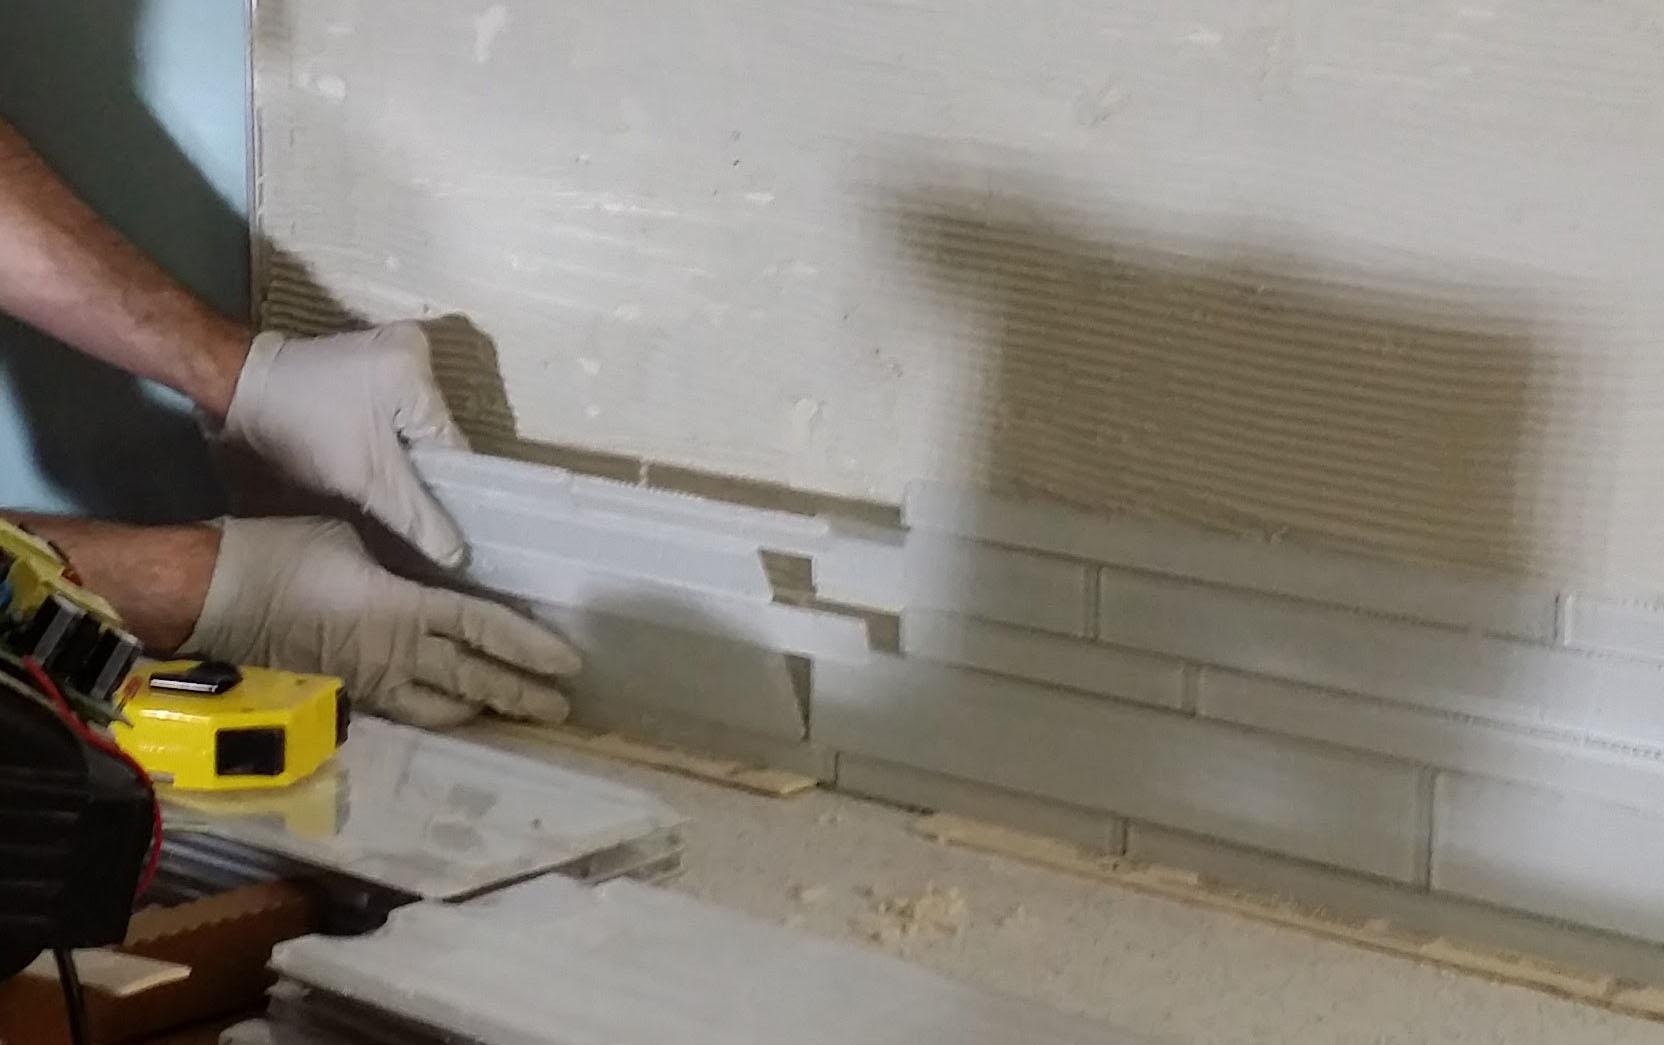 TILE - PLACING ON WALL